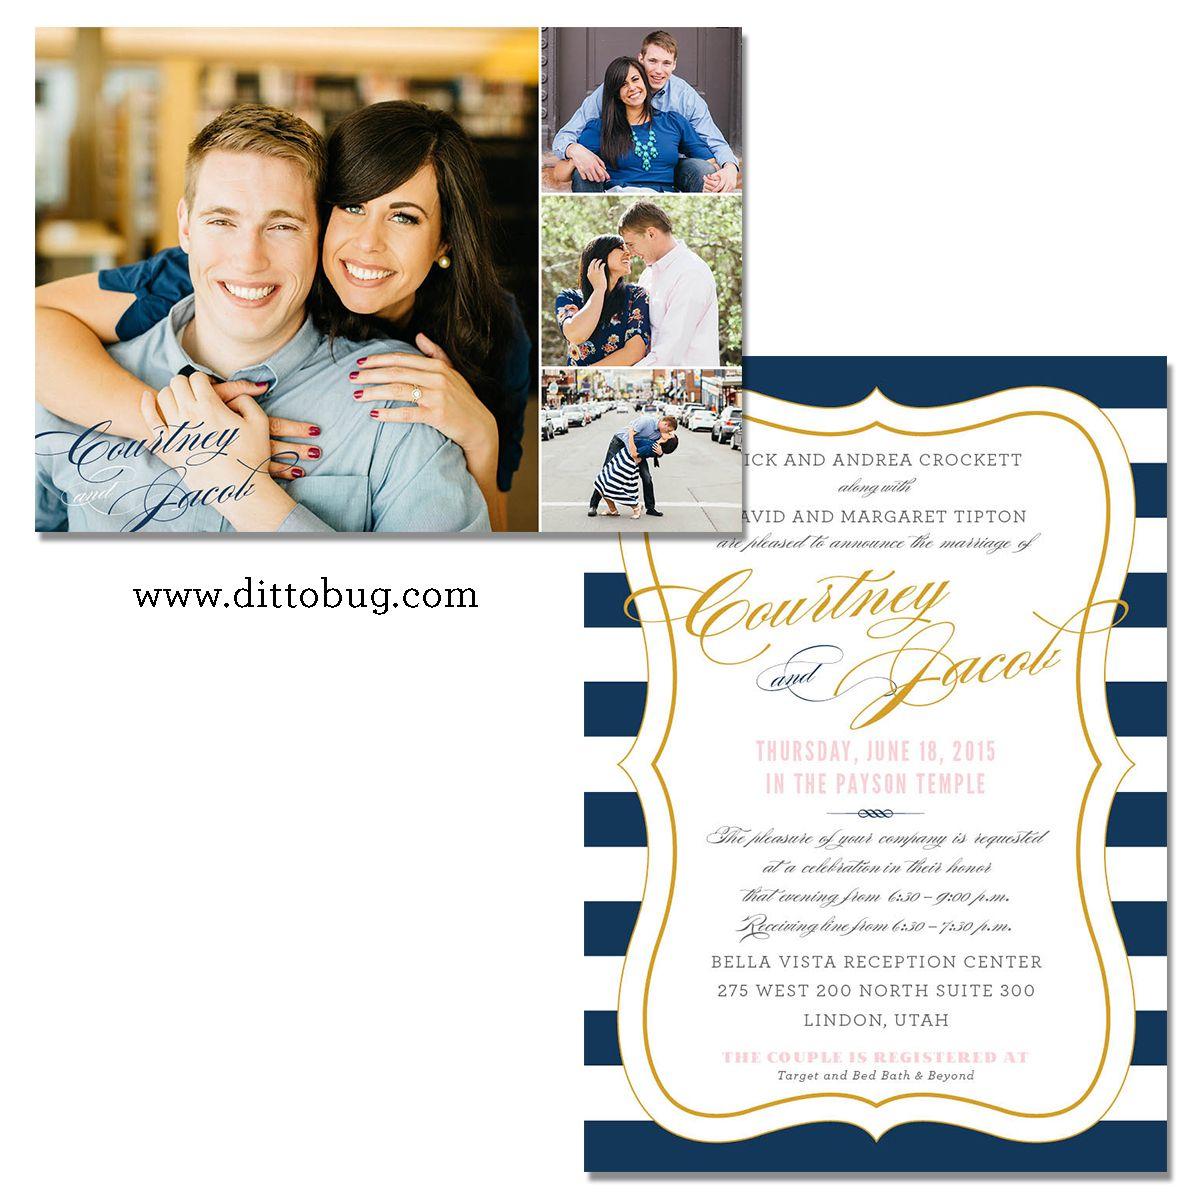 Dittobug Wedding Invitations Two Sided Wedding Invitation Photo Wedding Invita Utah Wedding Invitations Beautiful Wedding Announcements Wedding Invitations